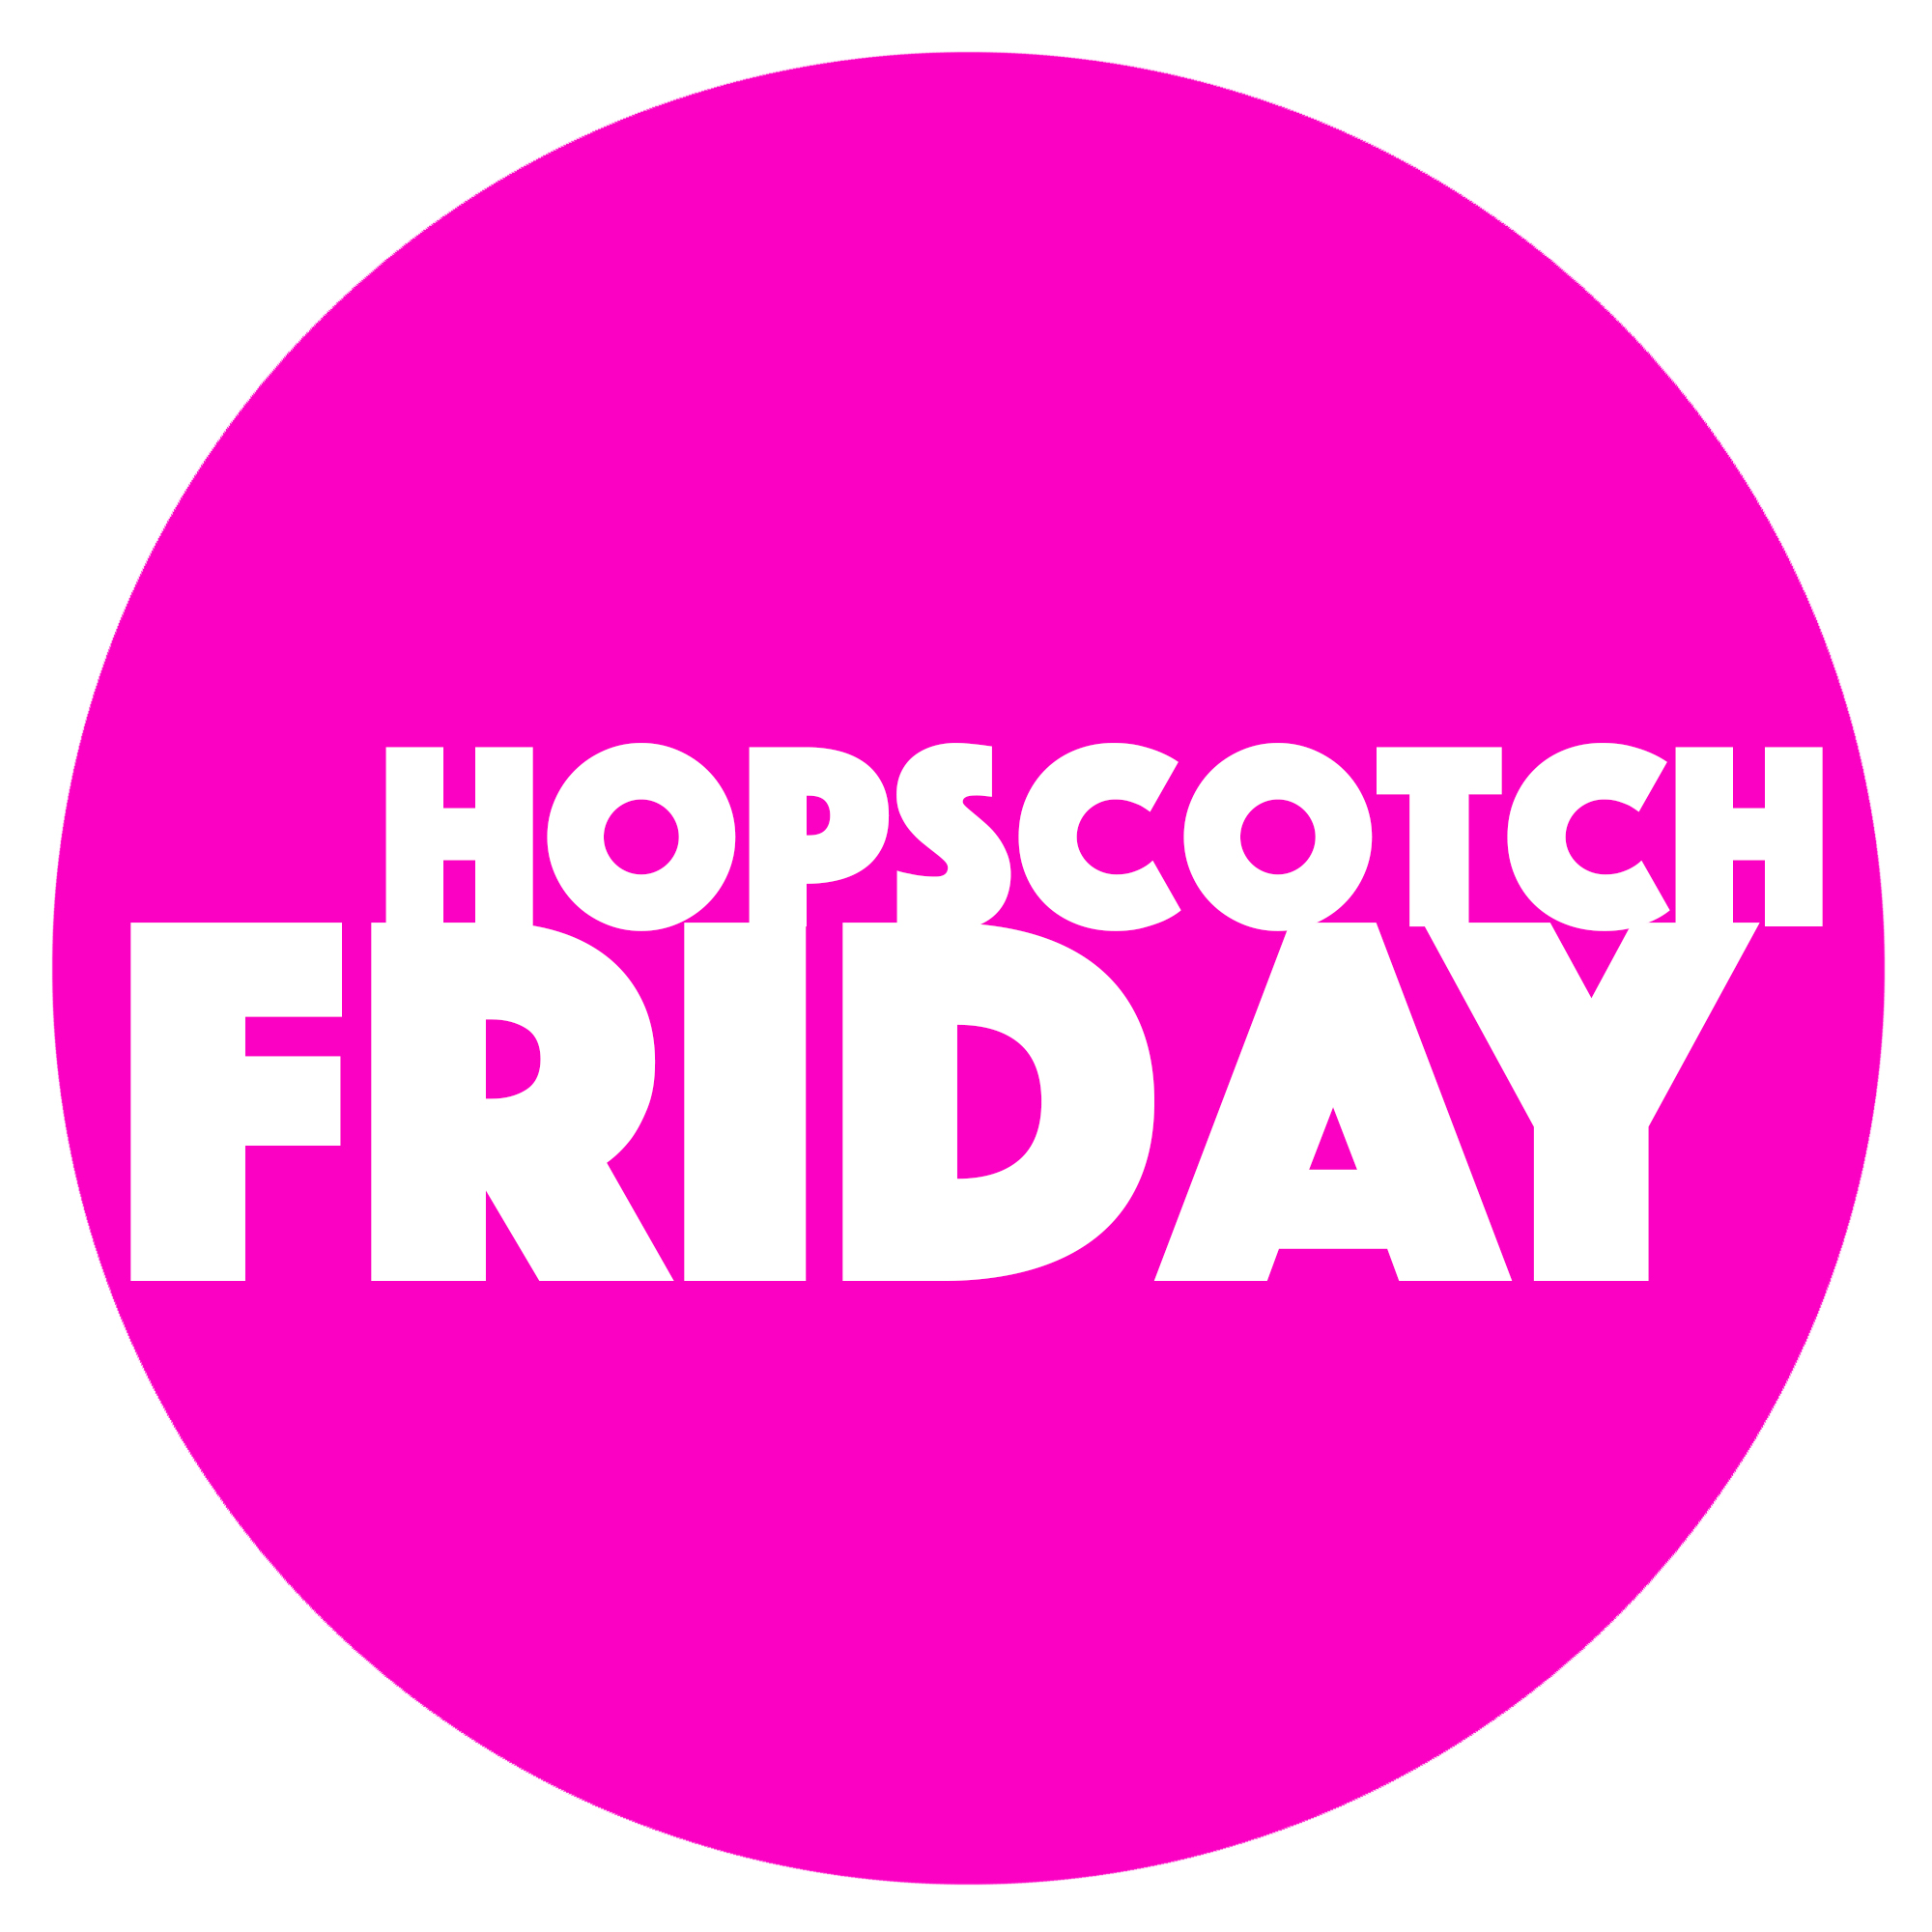 The Hopscotch Friday Podcast show art